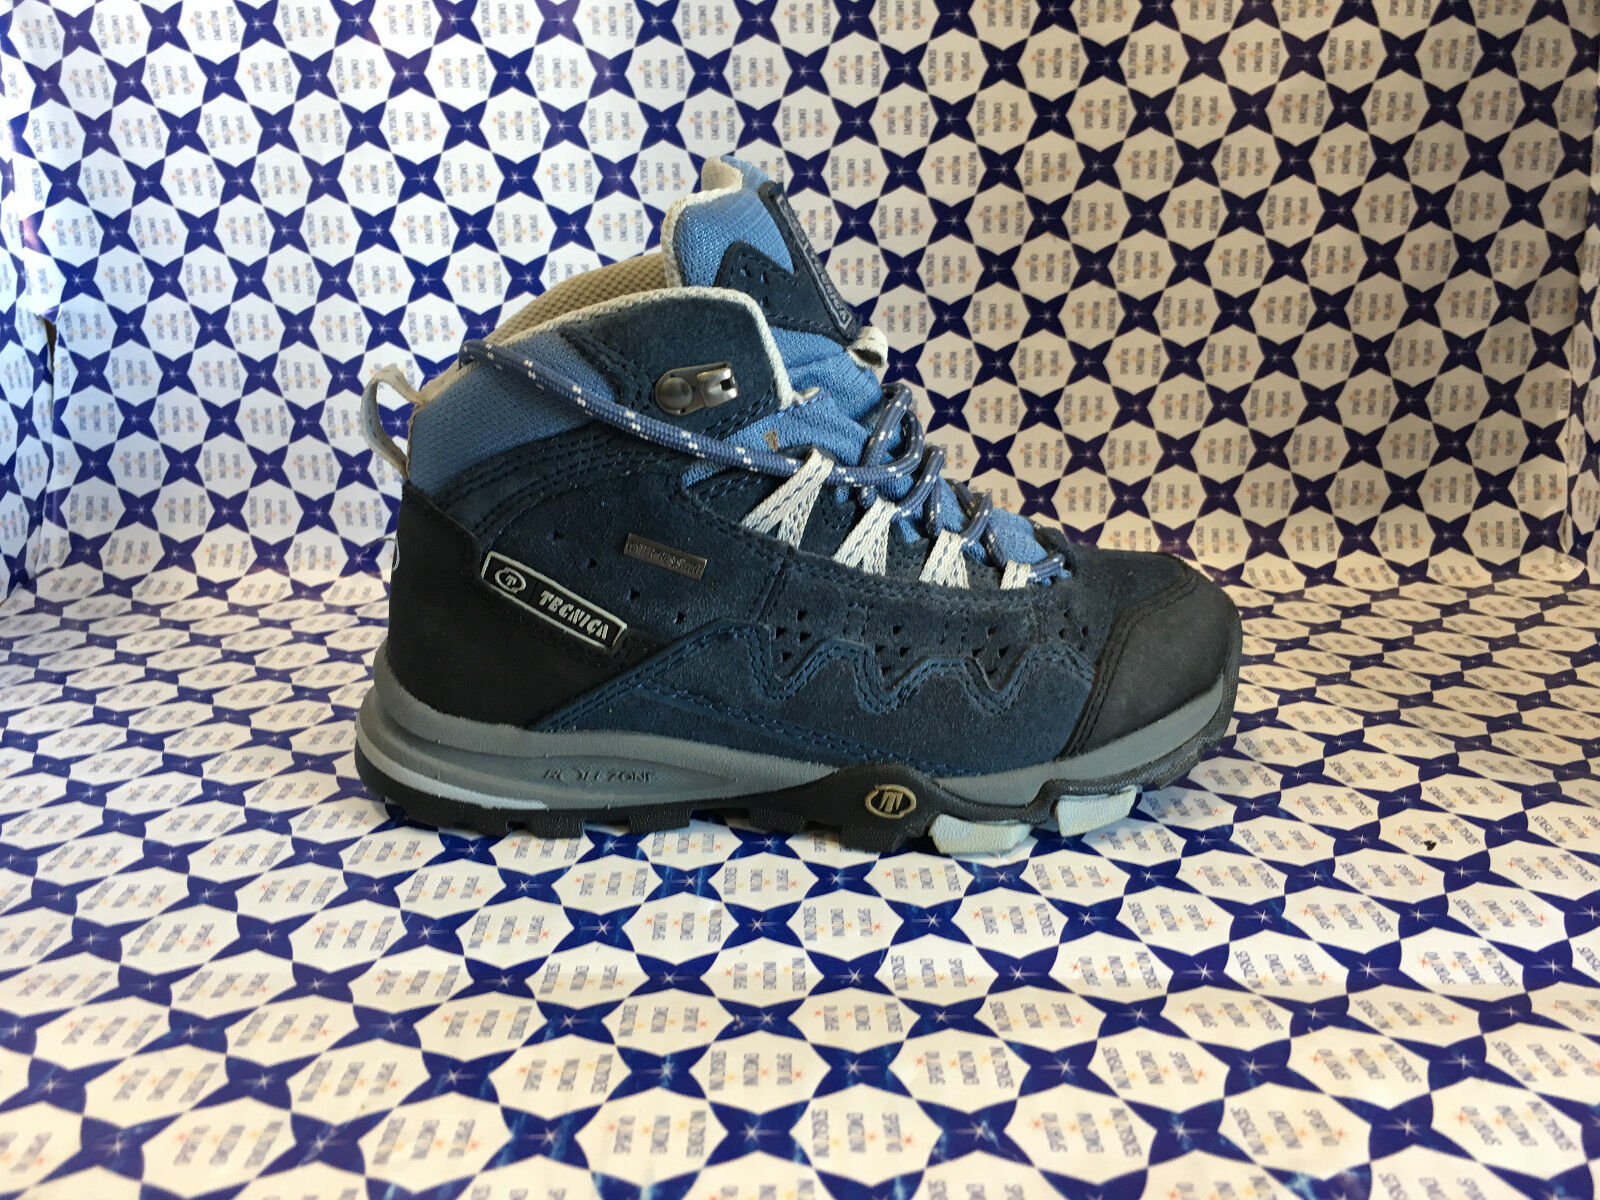 shoes Trekking Tecnica Junior Unisex - Cyclone 2 Mid - 311065